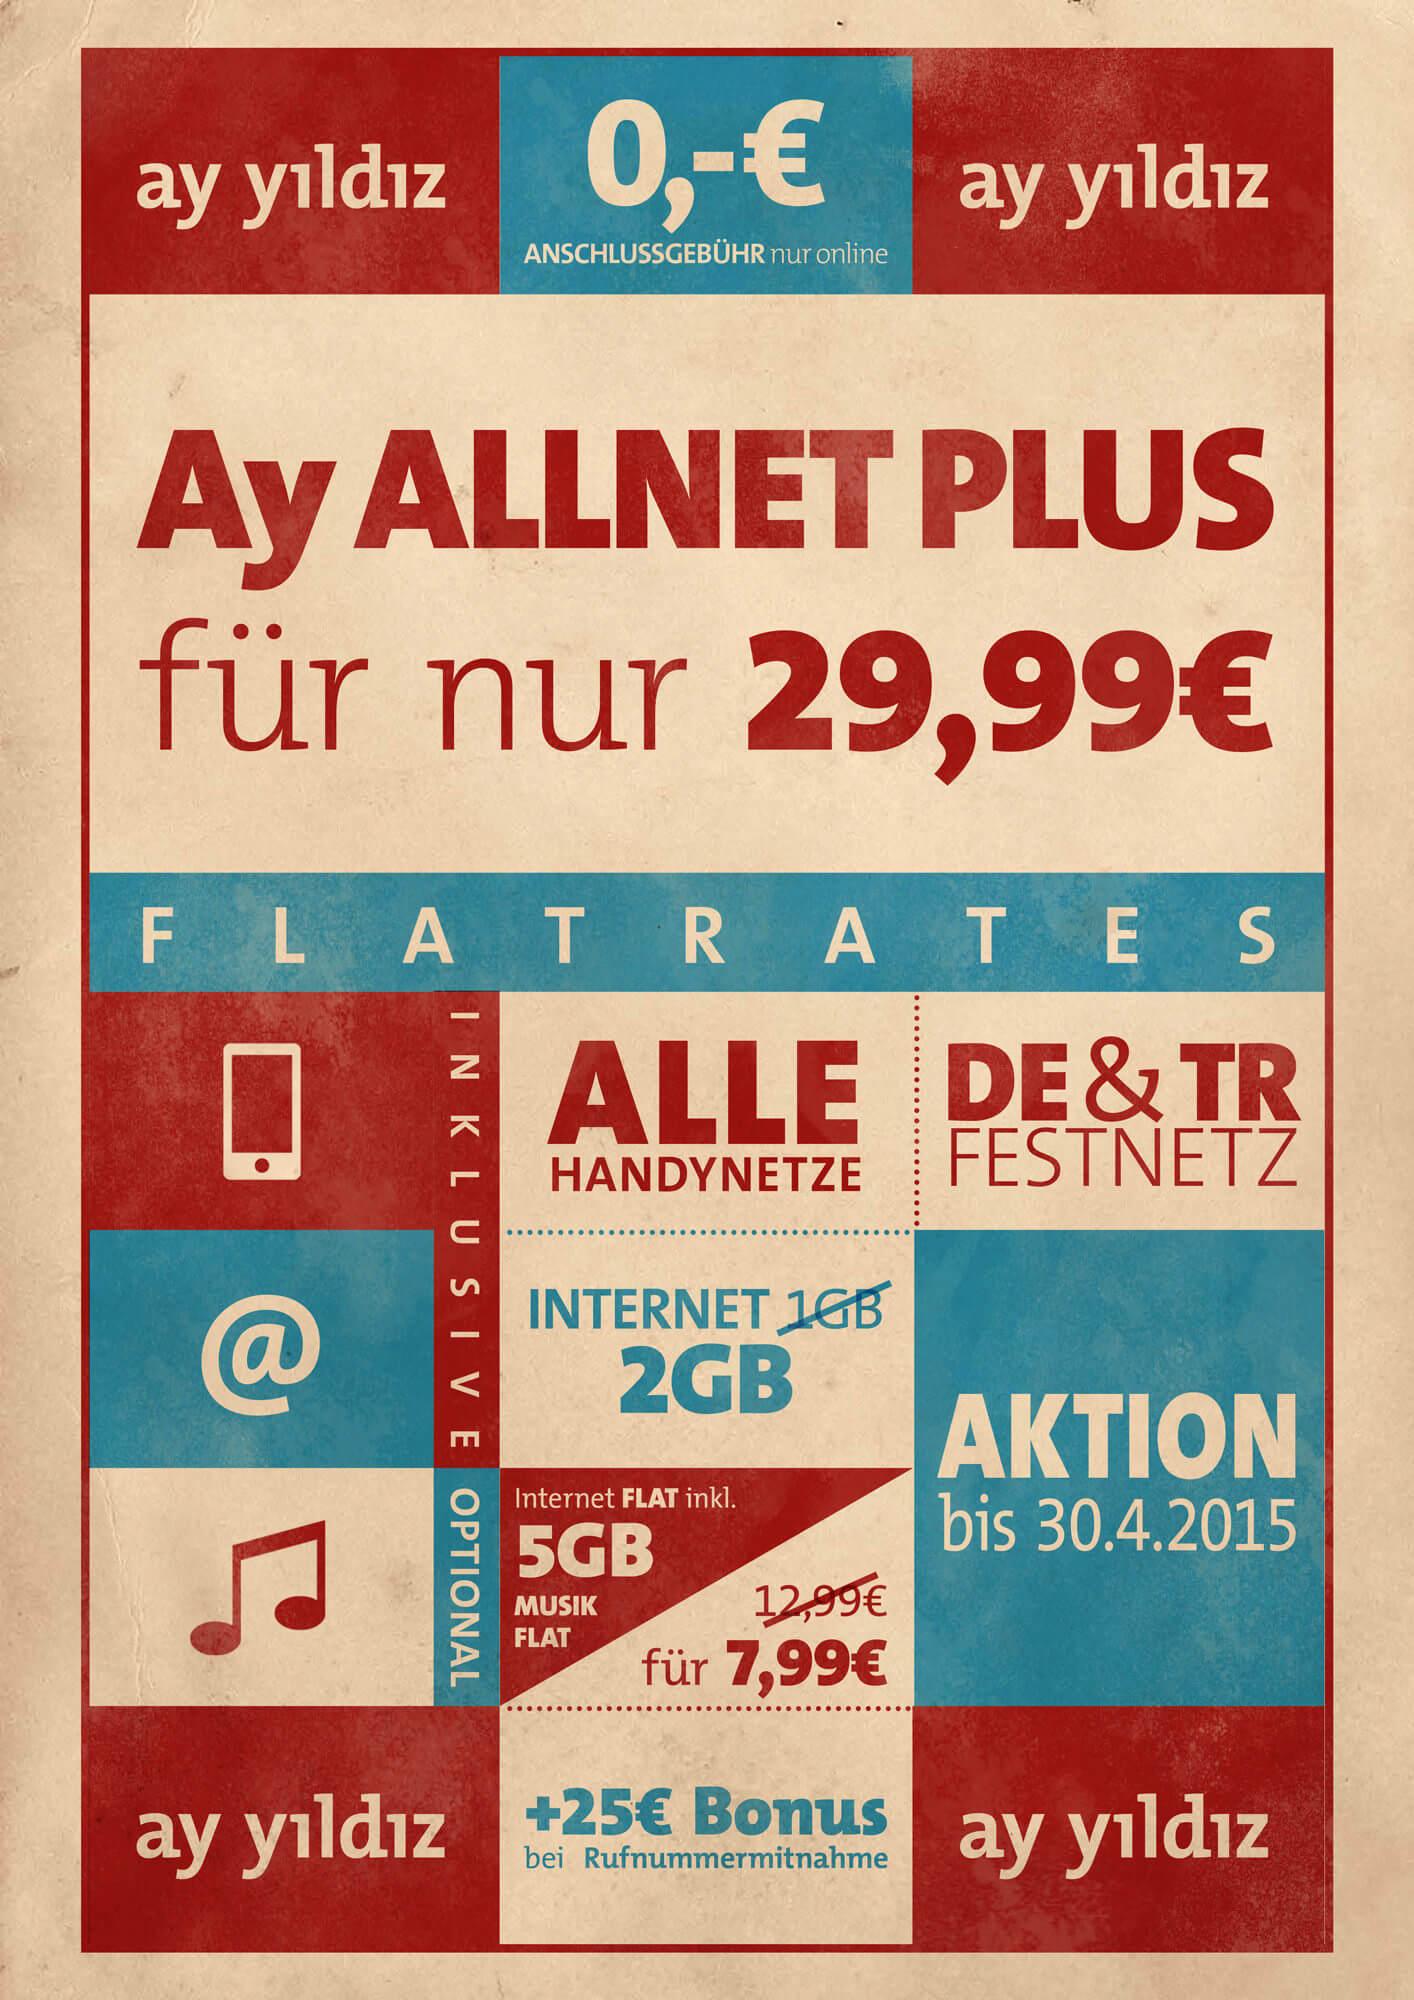 AY-YILDIZ-Infografik-Ay-Allnet-Plus